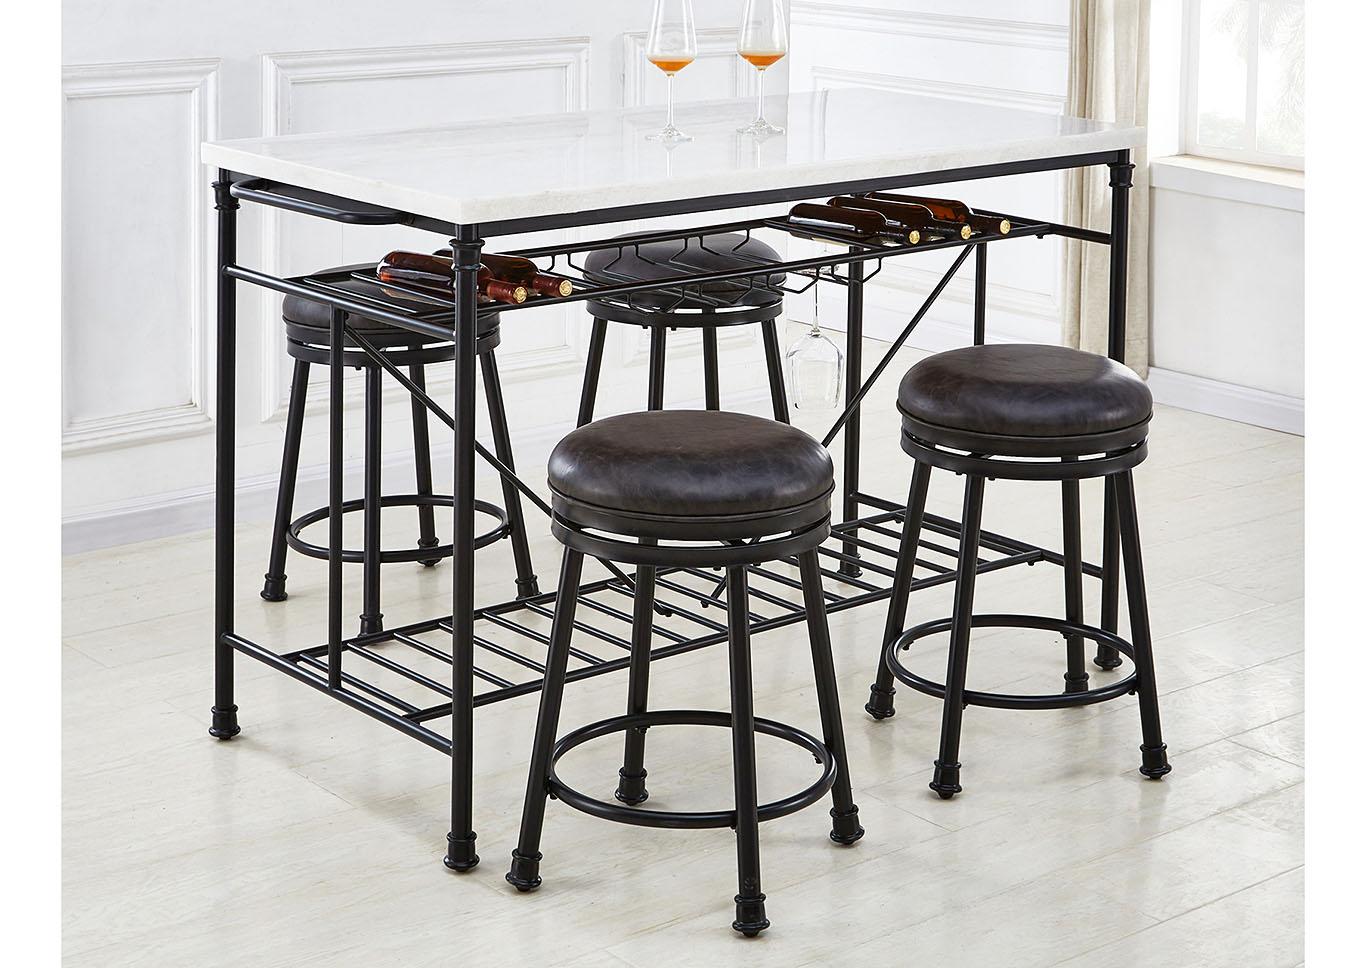 Claire White Black Marble Top Counter Kitchen Island Maverick Wholesale Furniture